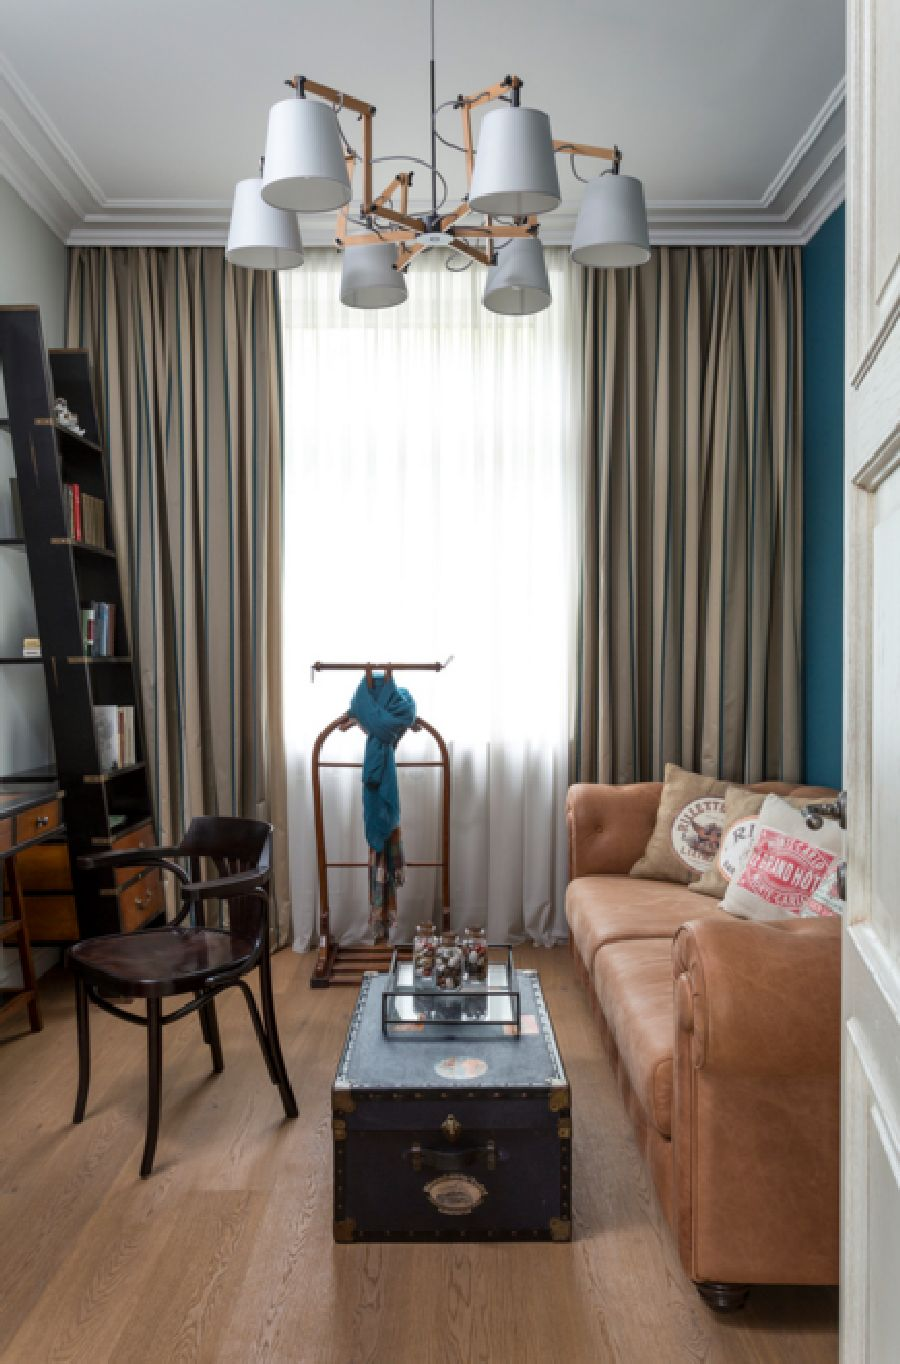 adelaparvu.com despre apartament de 80 mp patrati cu aer rustic elegant, locuinta Rusia, designer Zhenya Zhdanova (18)